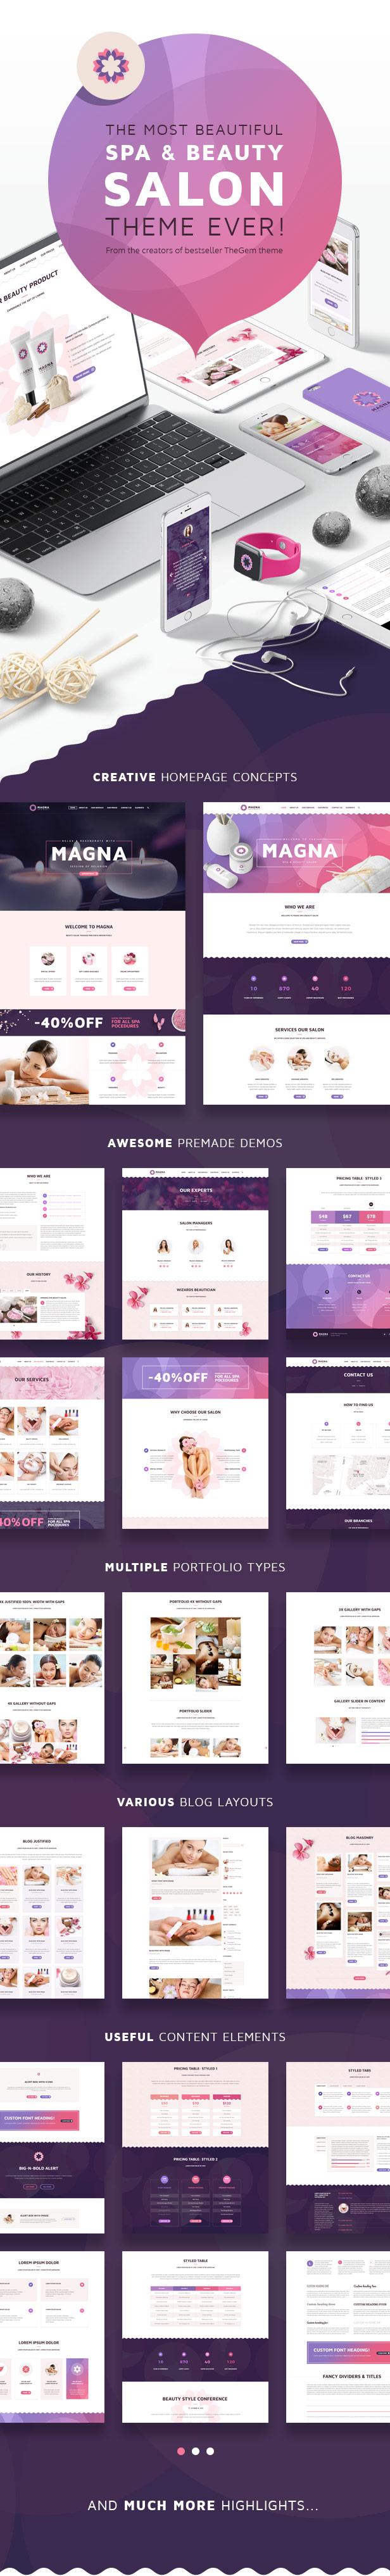 Magna - Spa Beauty Salon, Beauty & Spa, Health & Wellness WordPress Theme - 1